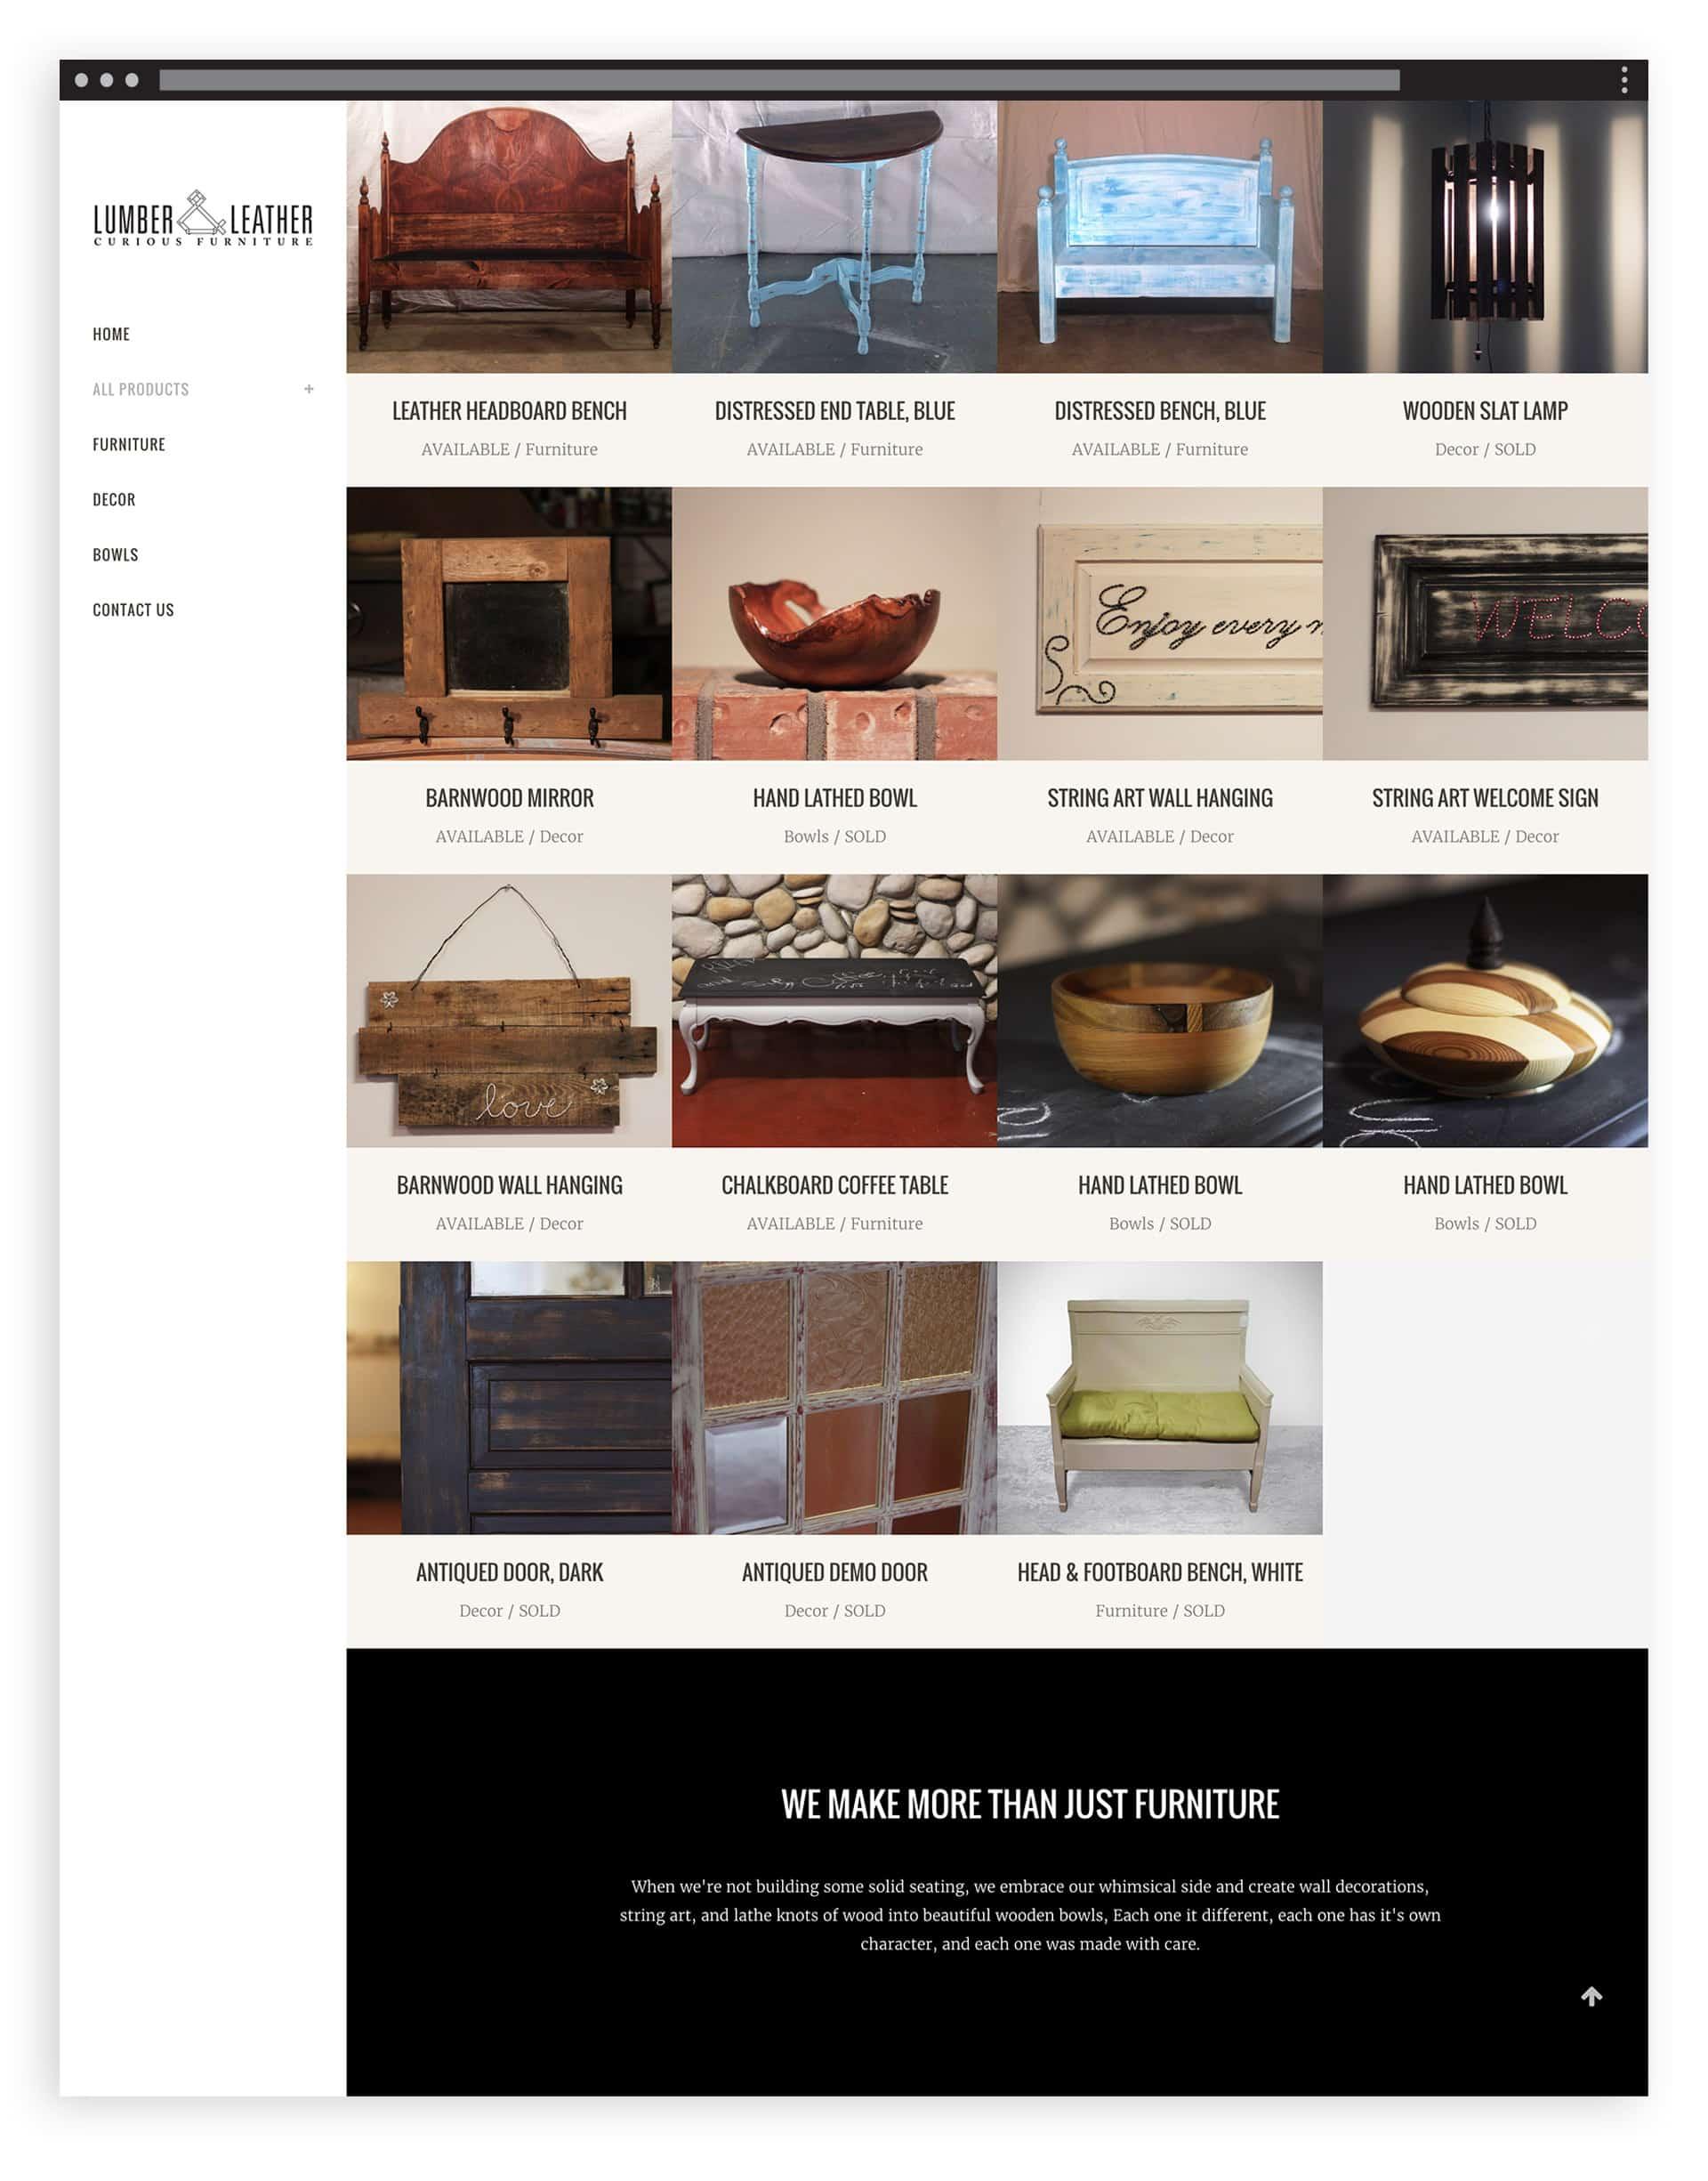 Lumbar & Leather - Website